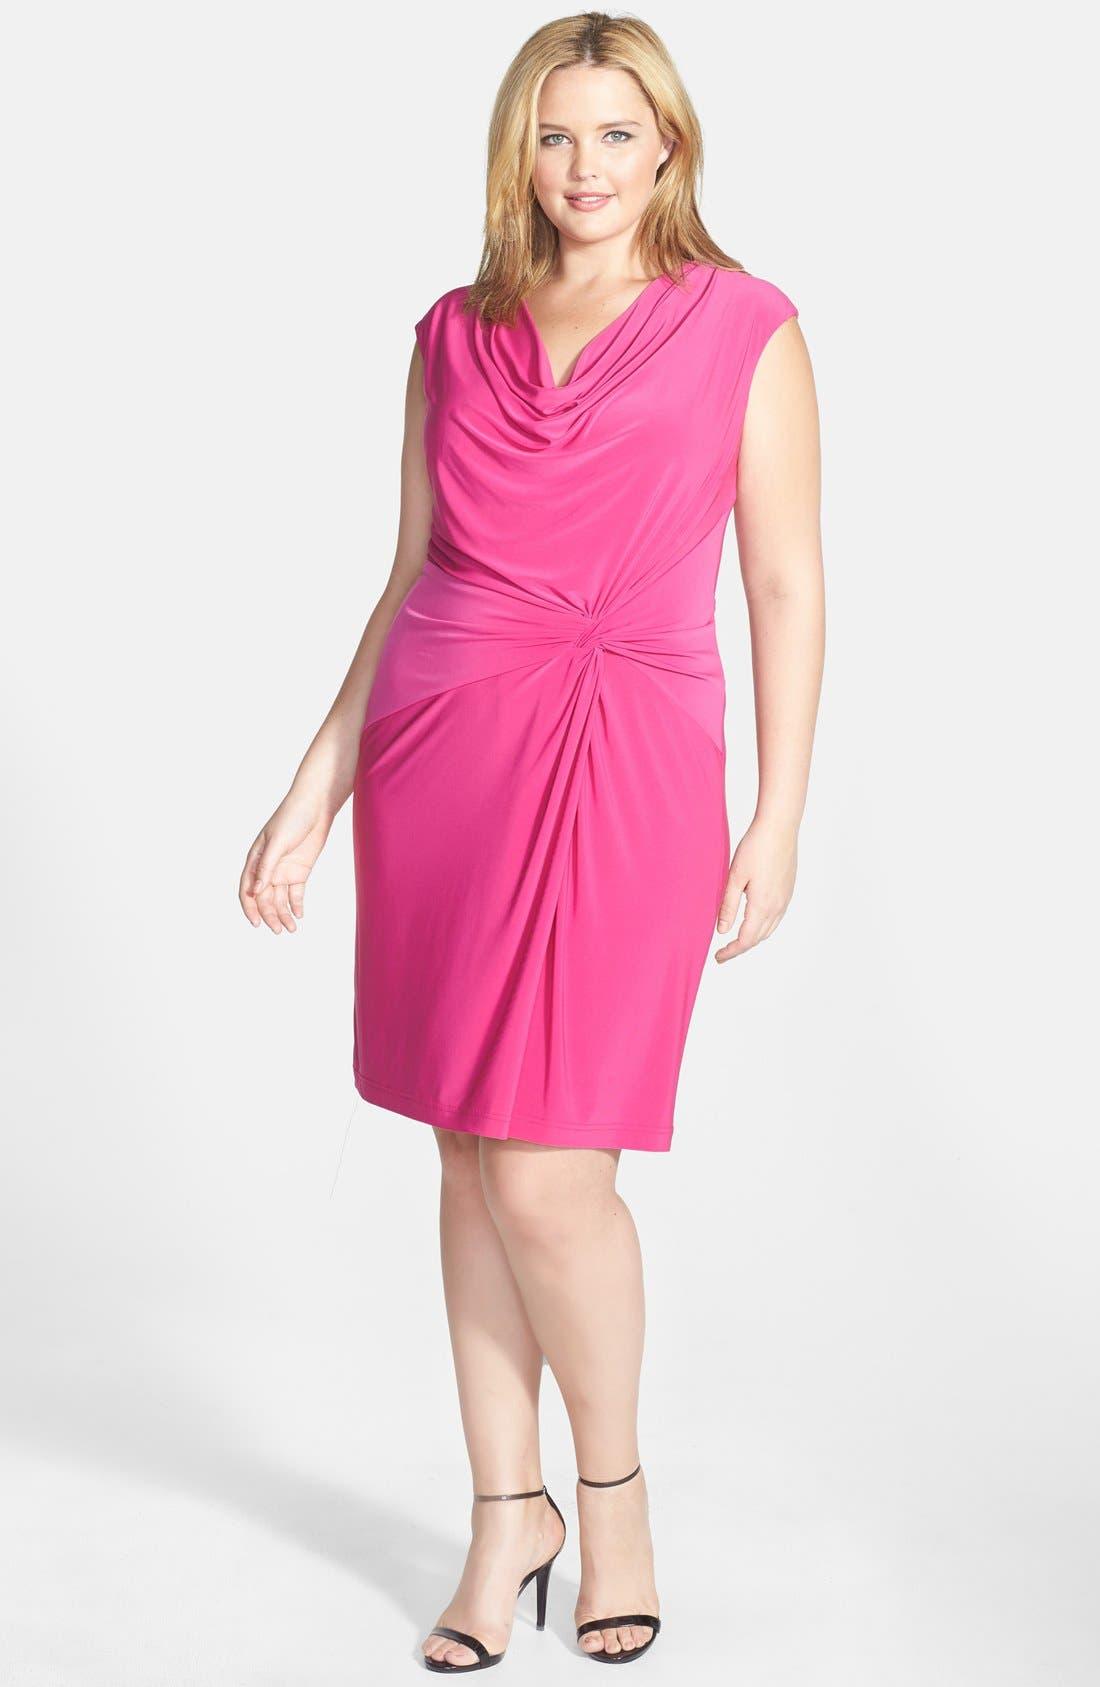 Alternate Image 1 Selected - Adrianna Papell Asymmetric Drape Cowl Neck Jersey Sheath Dress (Plus Size)